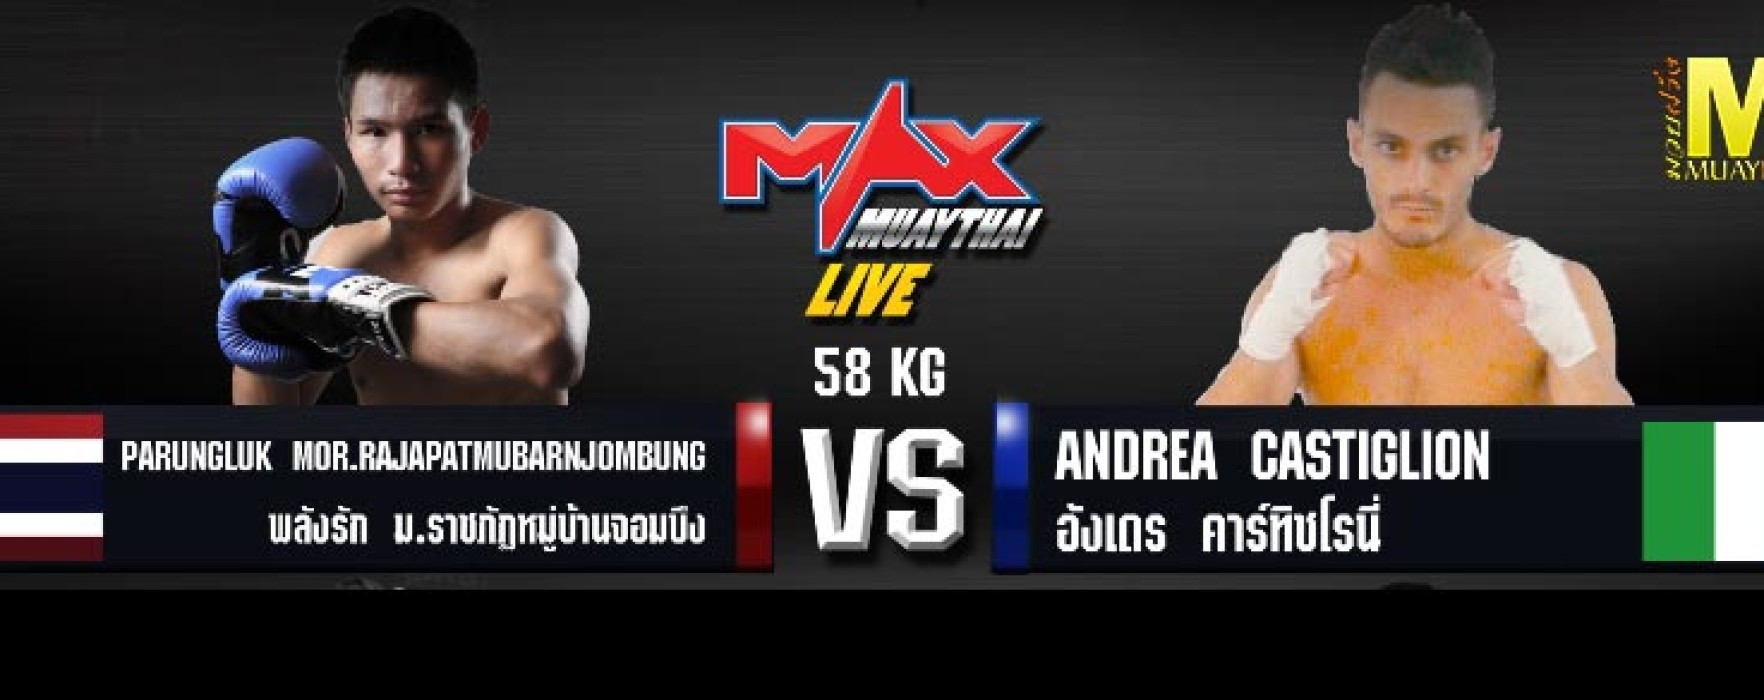 Flash News: Andrea Castiglioni (Fimt) promoted by Muay Farang at Max Muay Thai Live – 24/08/2014